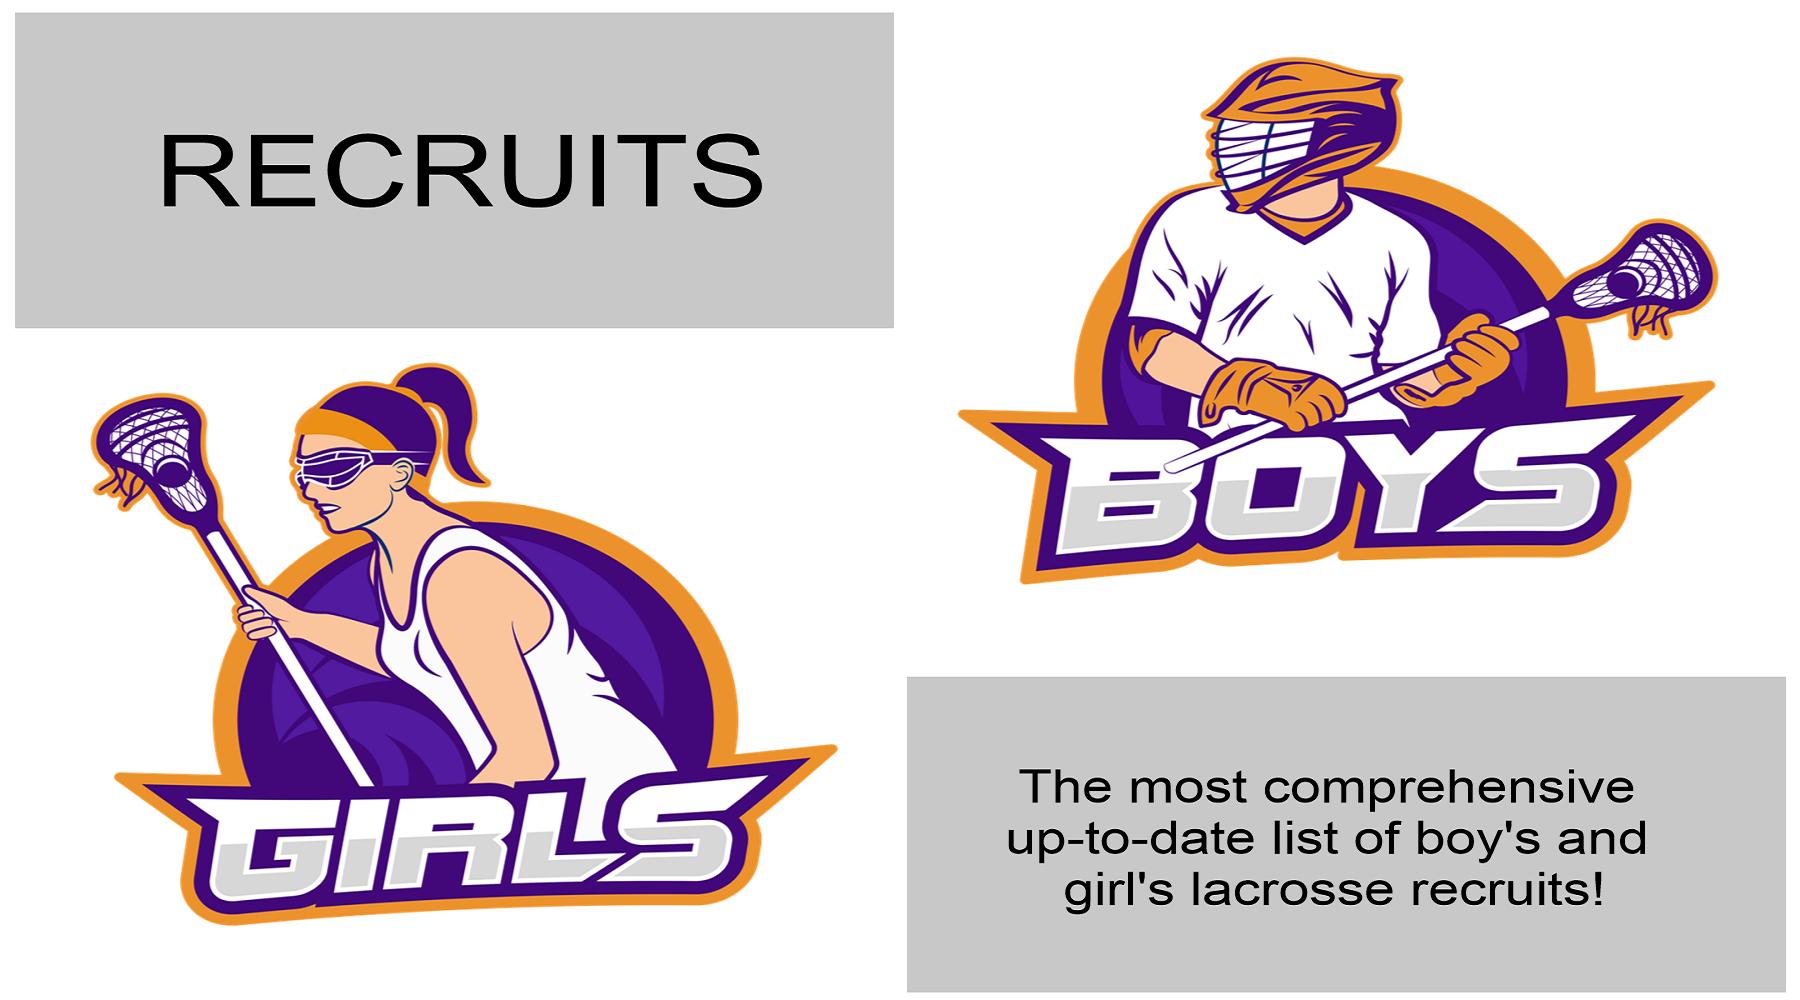 Lacrosse Recruits